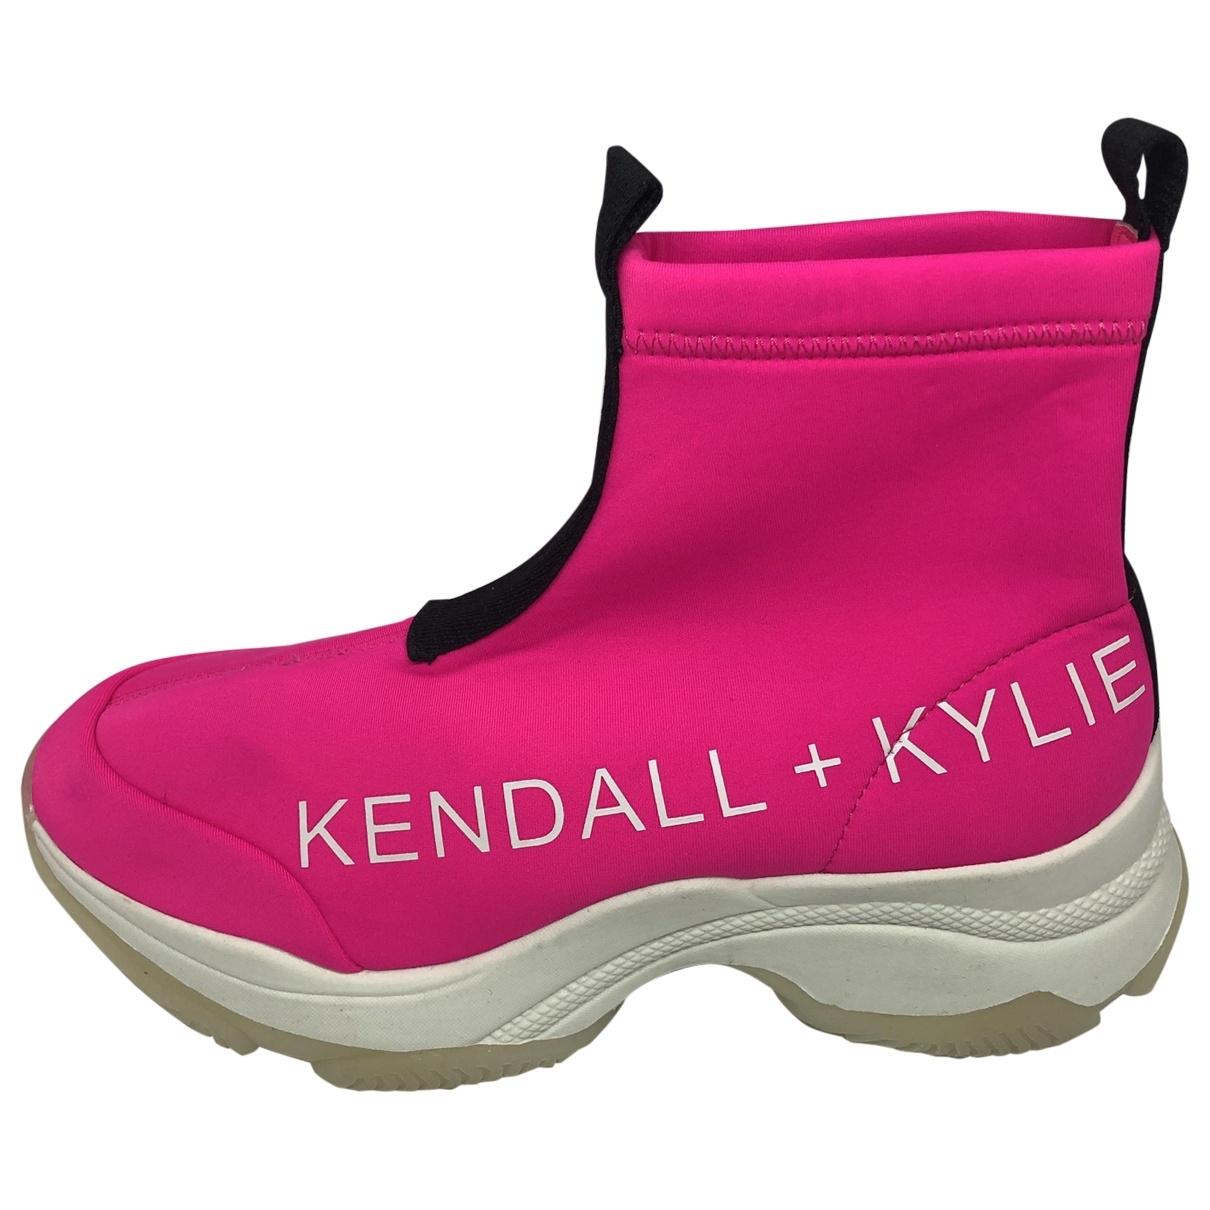 Kendall + Kylie - Baskets   pour femme - rose